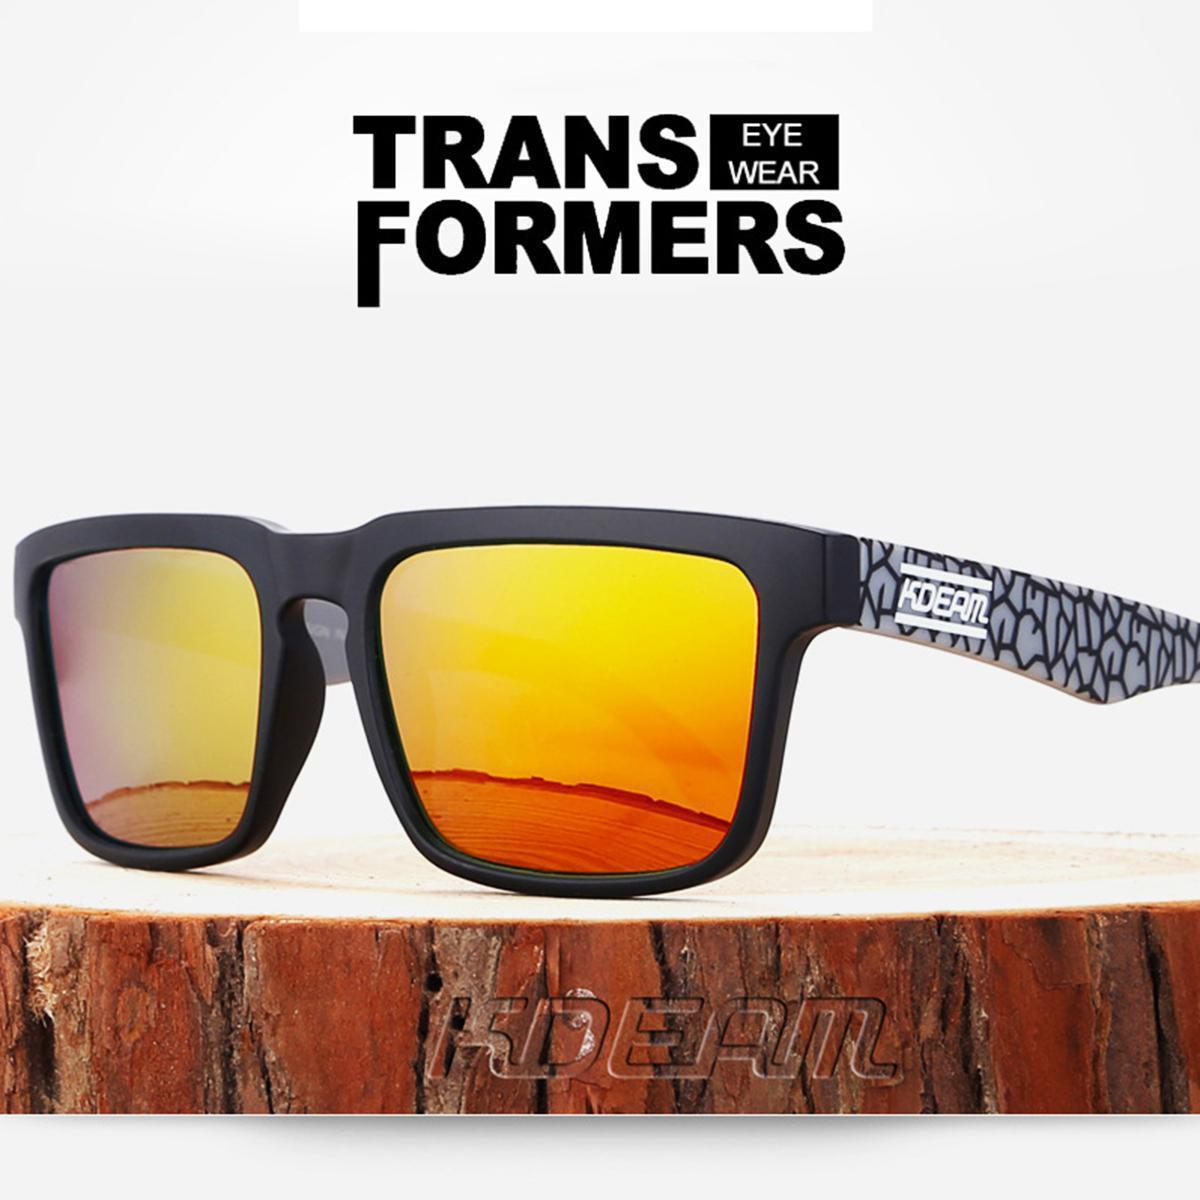 66837b0209 KDEAM Men Women Polarized UV400 Sunglasses Sport Driving Fishing Cycling  Eyewear